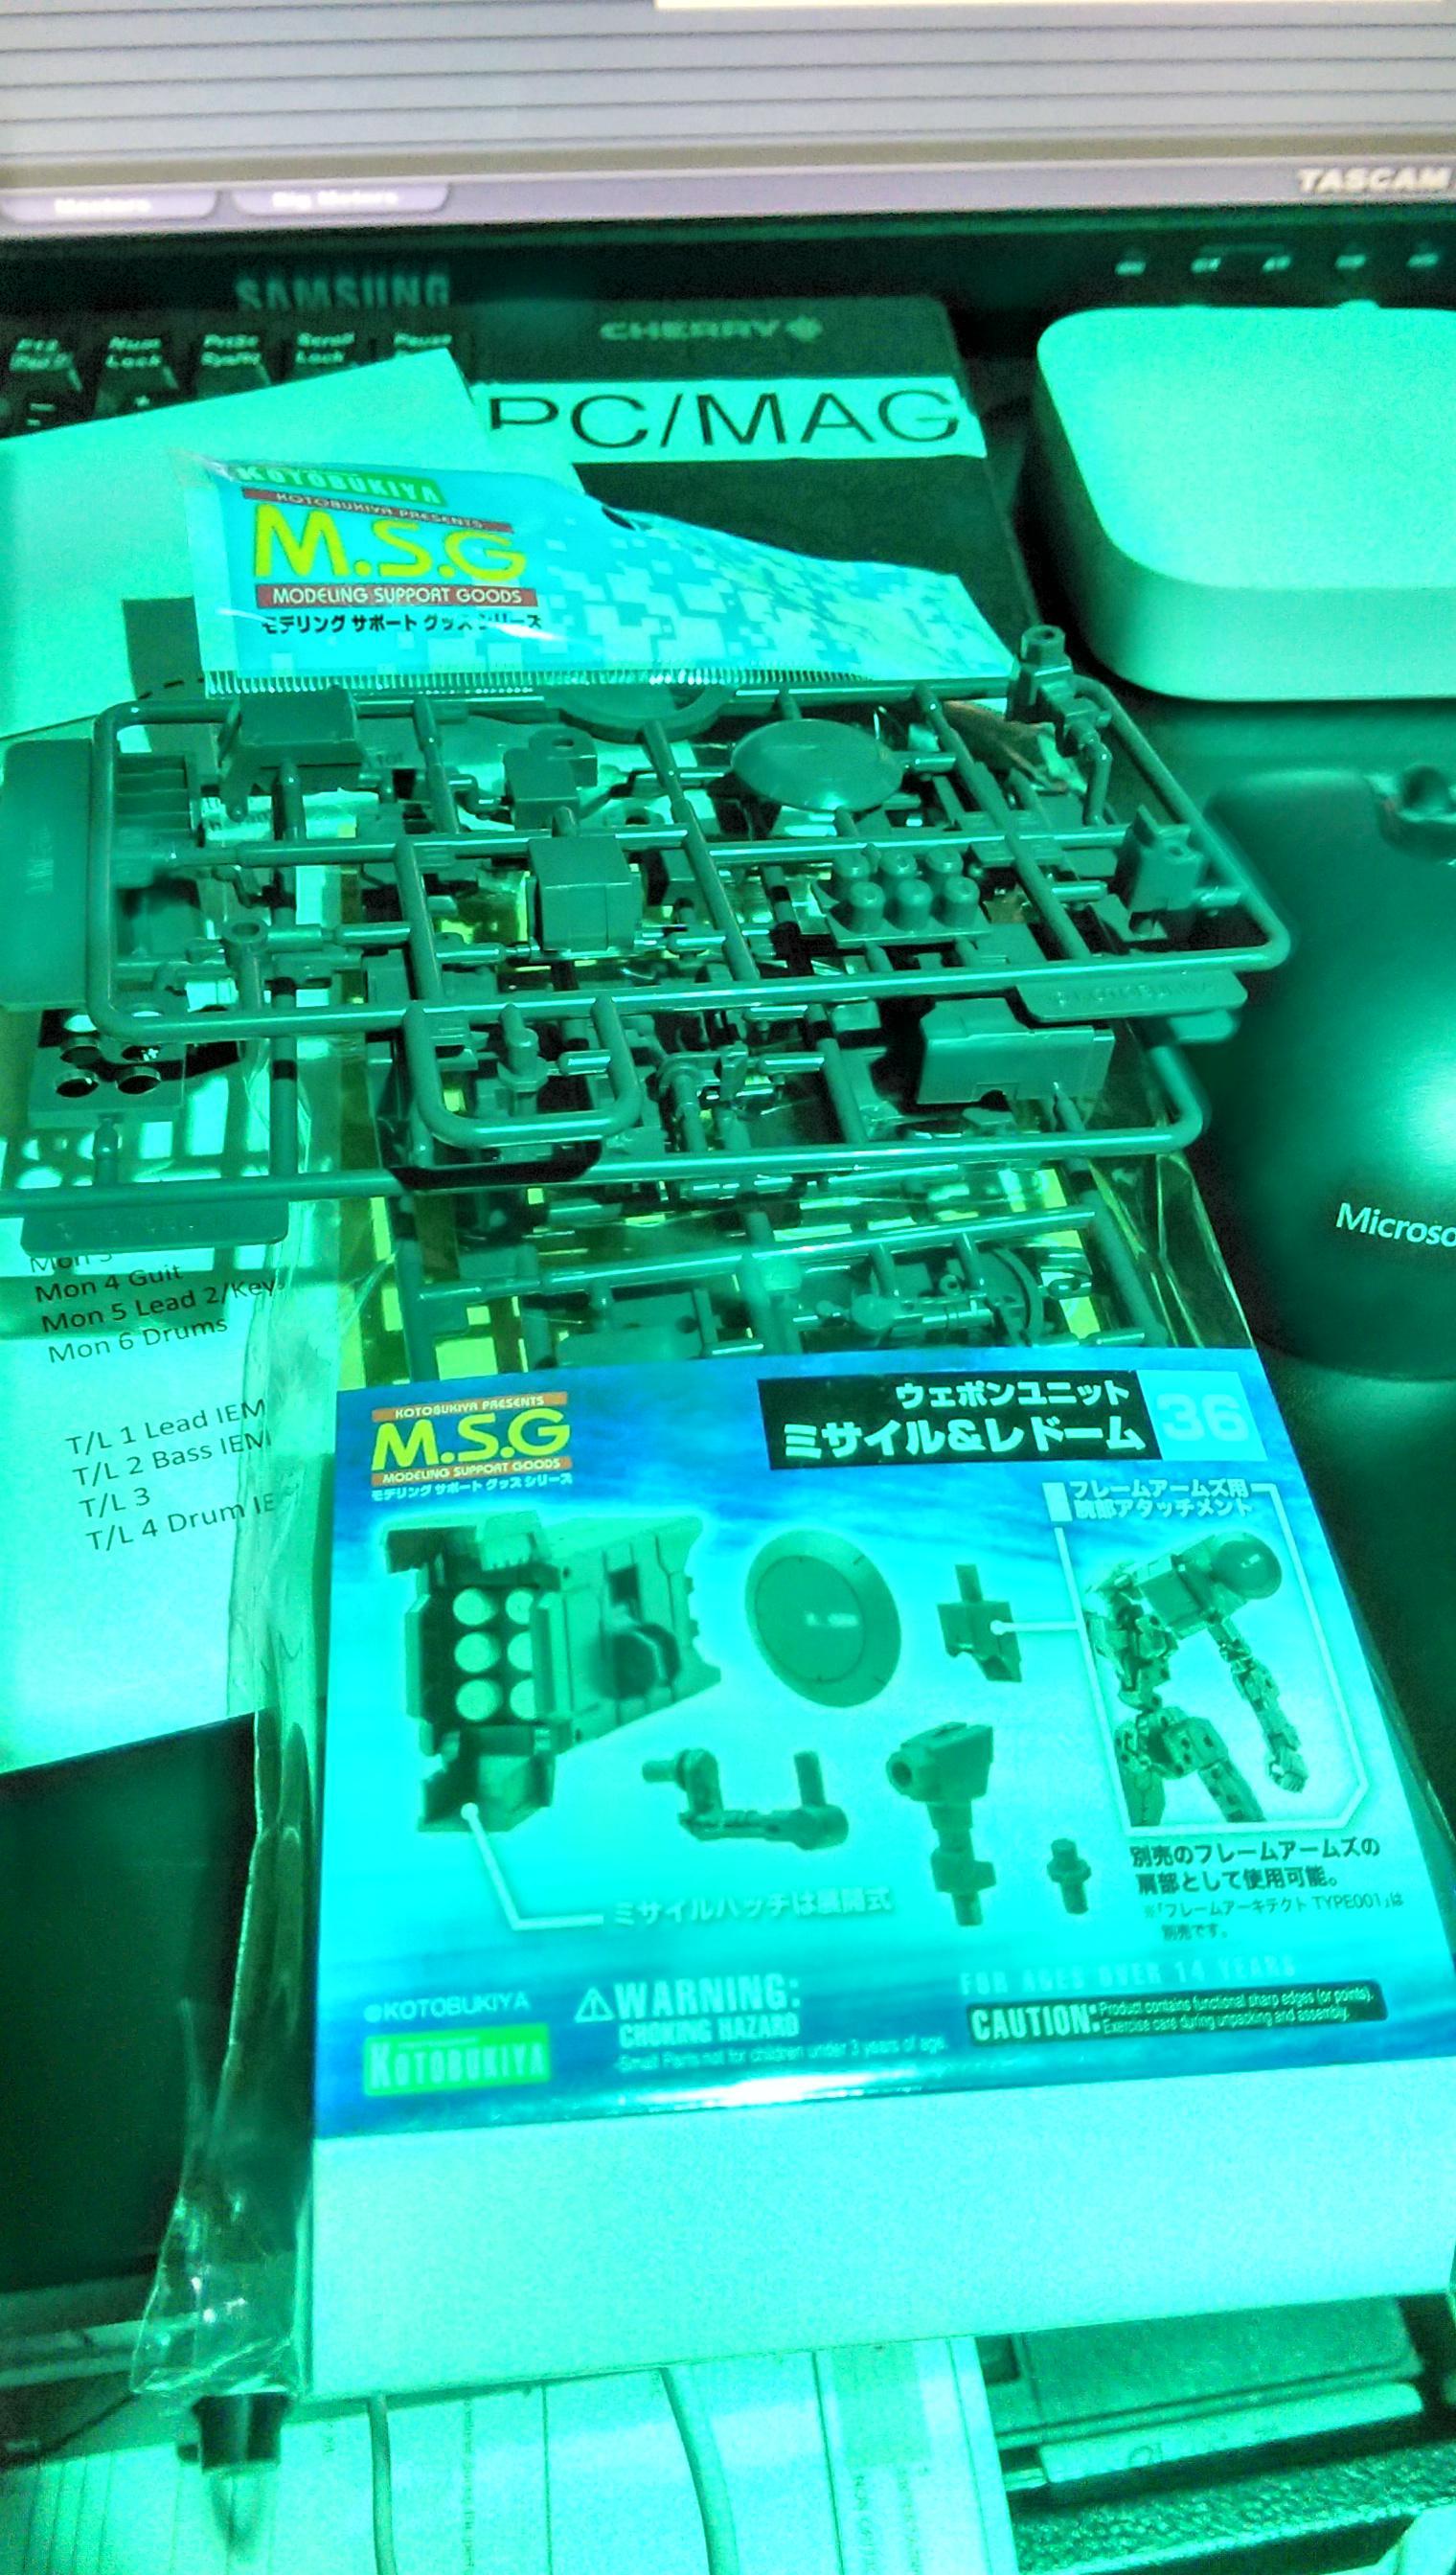 Bandai, Gundam, Kotokobudia, Missile, Riptide, Smart, System, Tau, Warhammer 40,000, Xv104